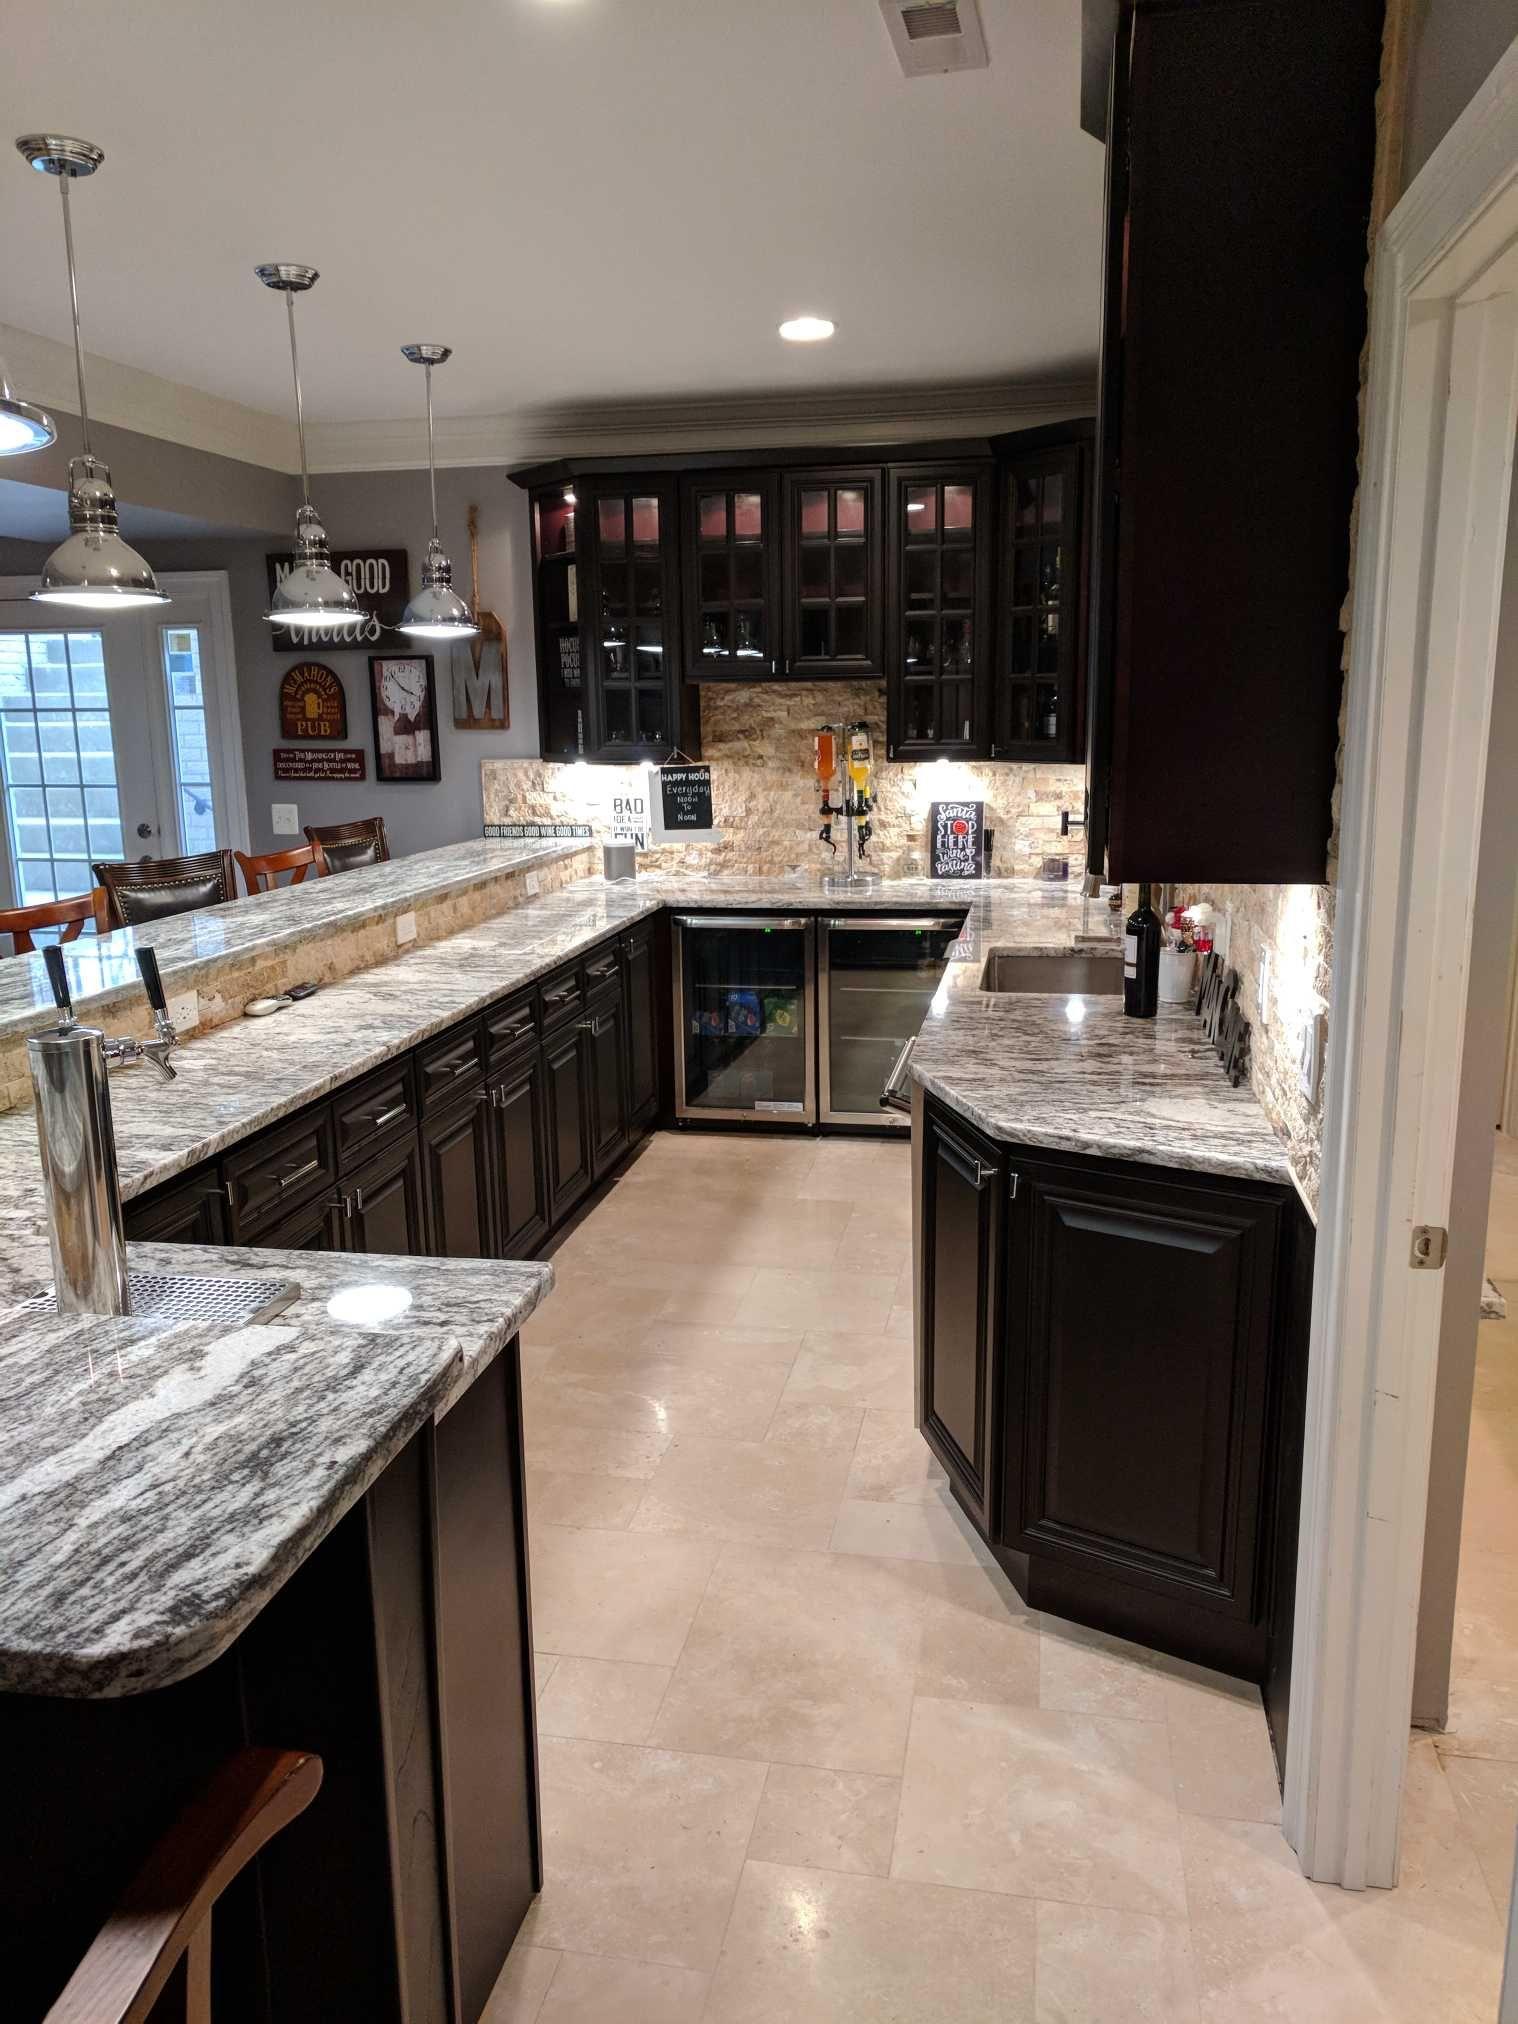 Kitchen Wine Cellar Makeover In Espresso Water Based Wood Stain Water Based Wood Stain Kitchen Cabinet Colors Kitchen Design Pictures